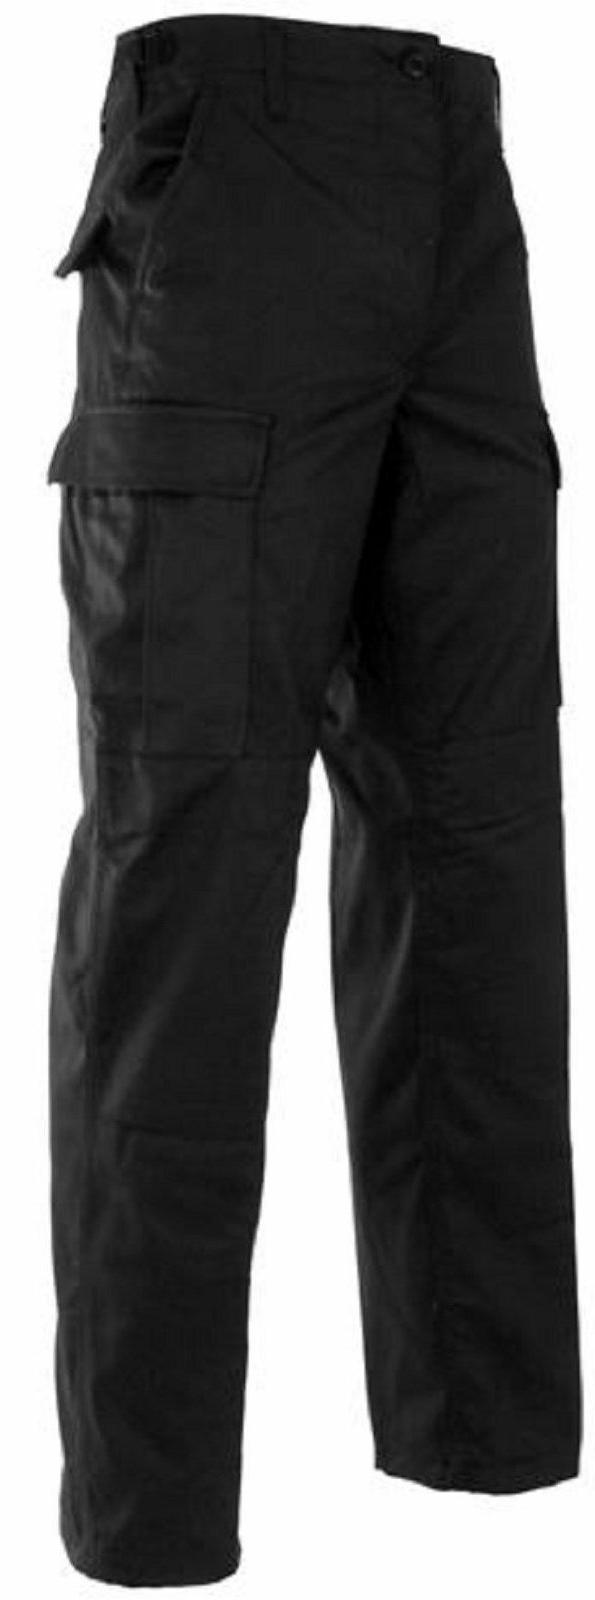 black 5923 bdu pants 100 percent cotton